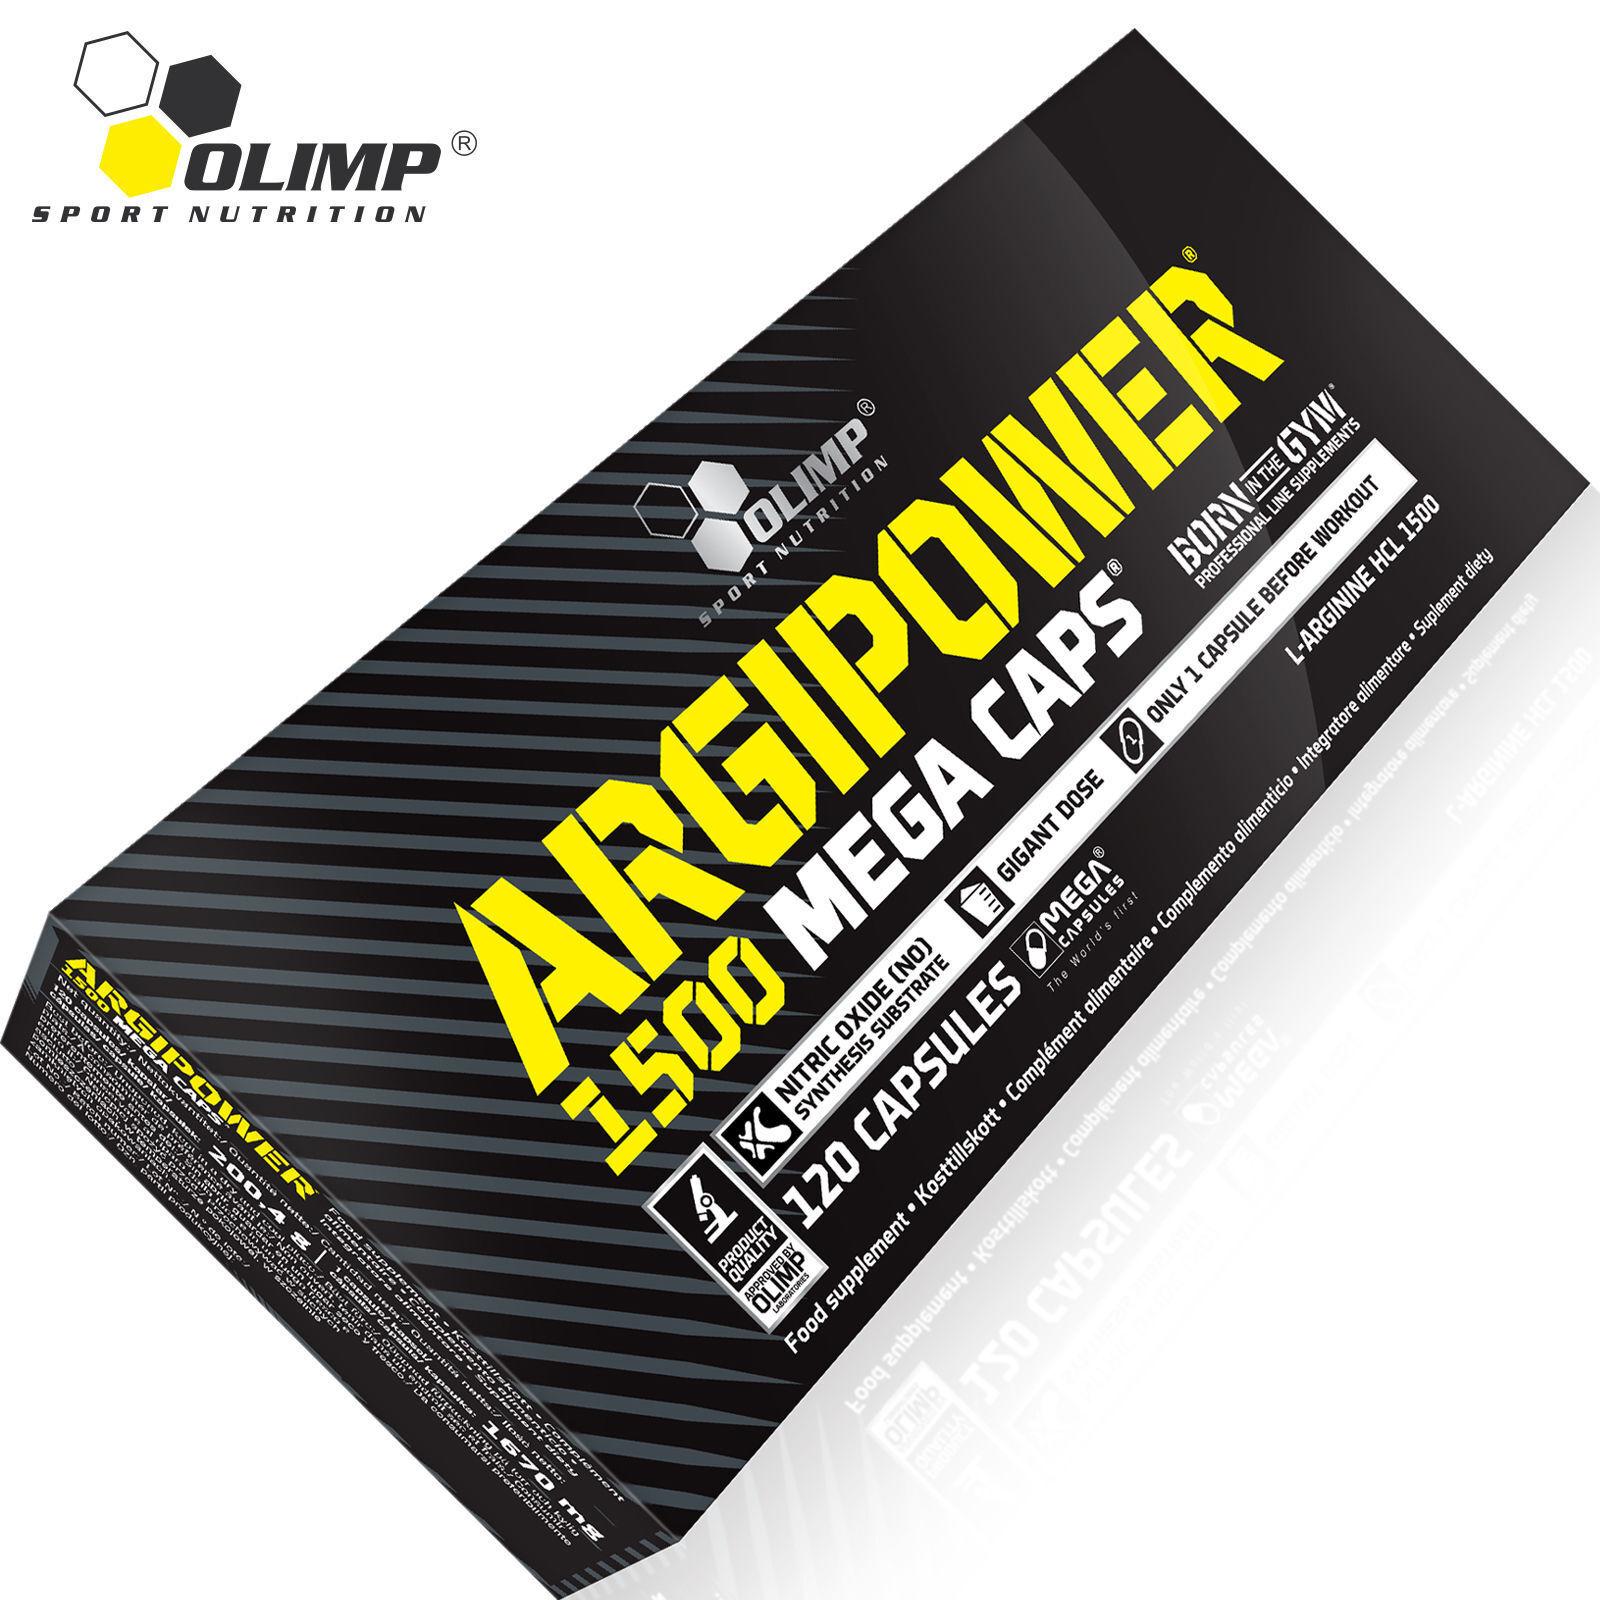 ARGIPOWER BLISTERS L-Arginine Nitric Oxide Muscle Pump & Grow Bodybuilding 1